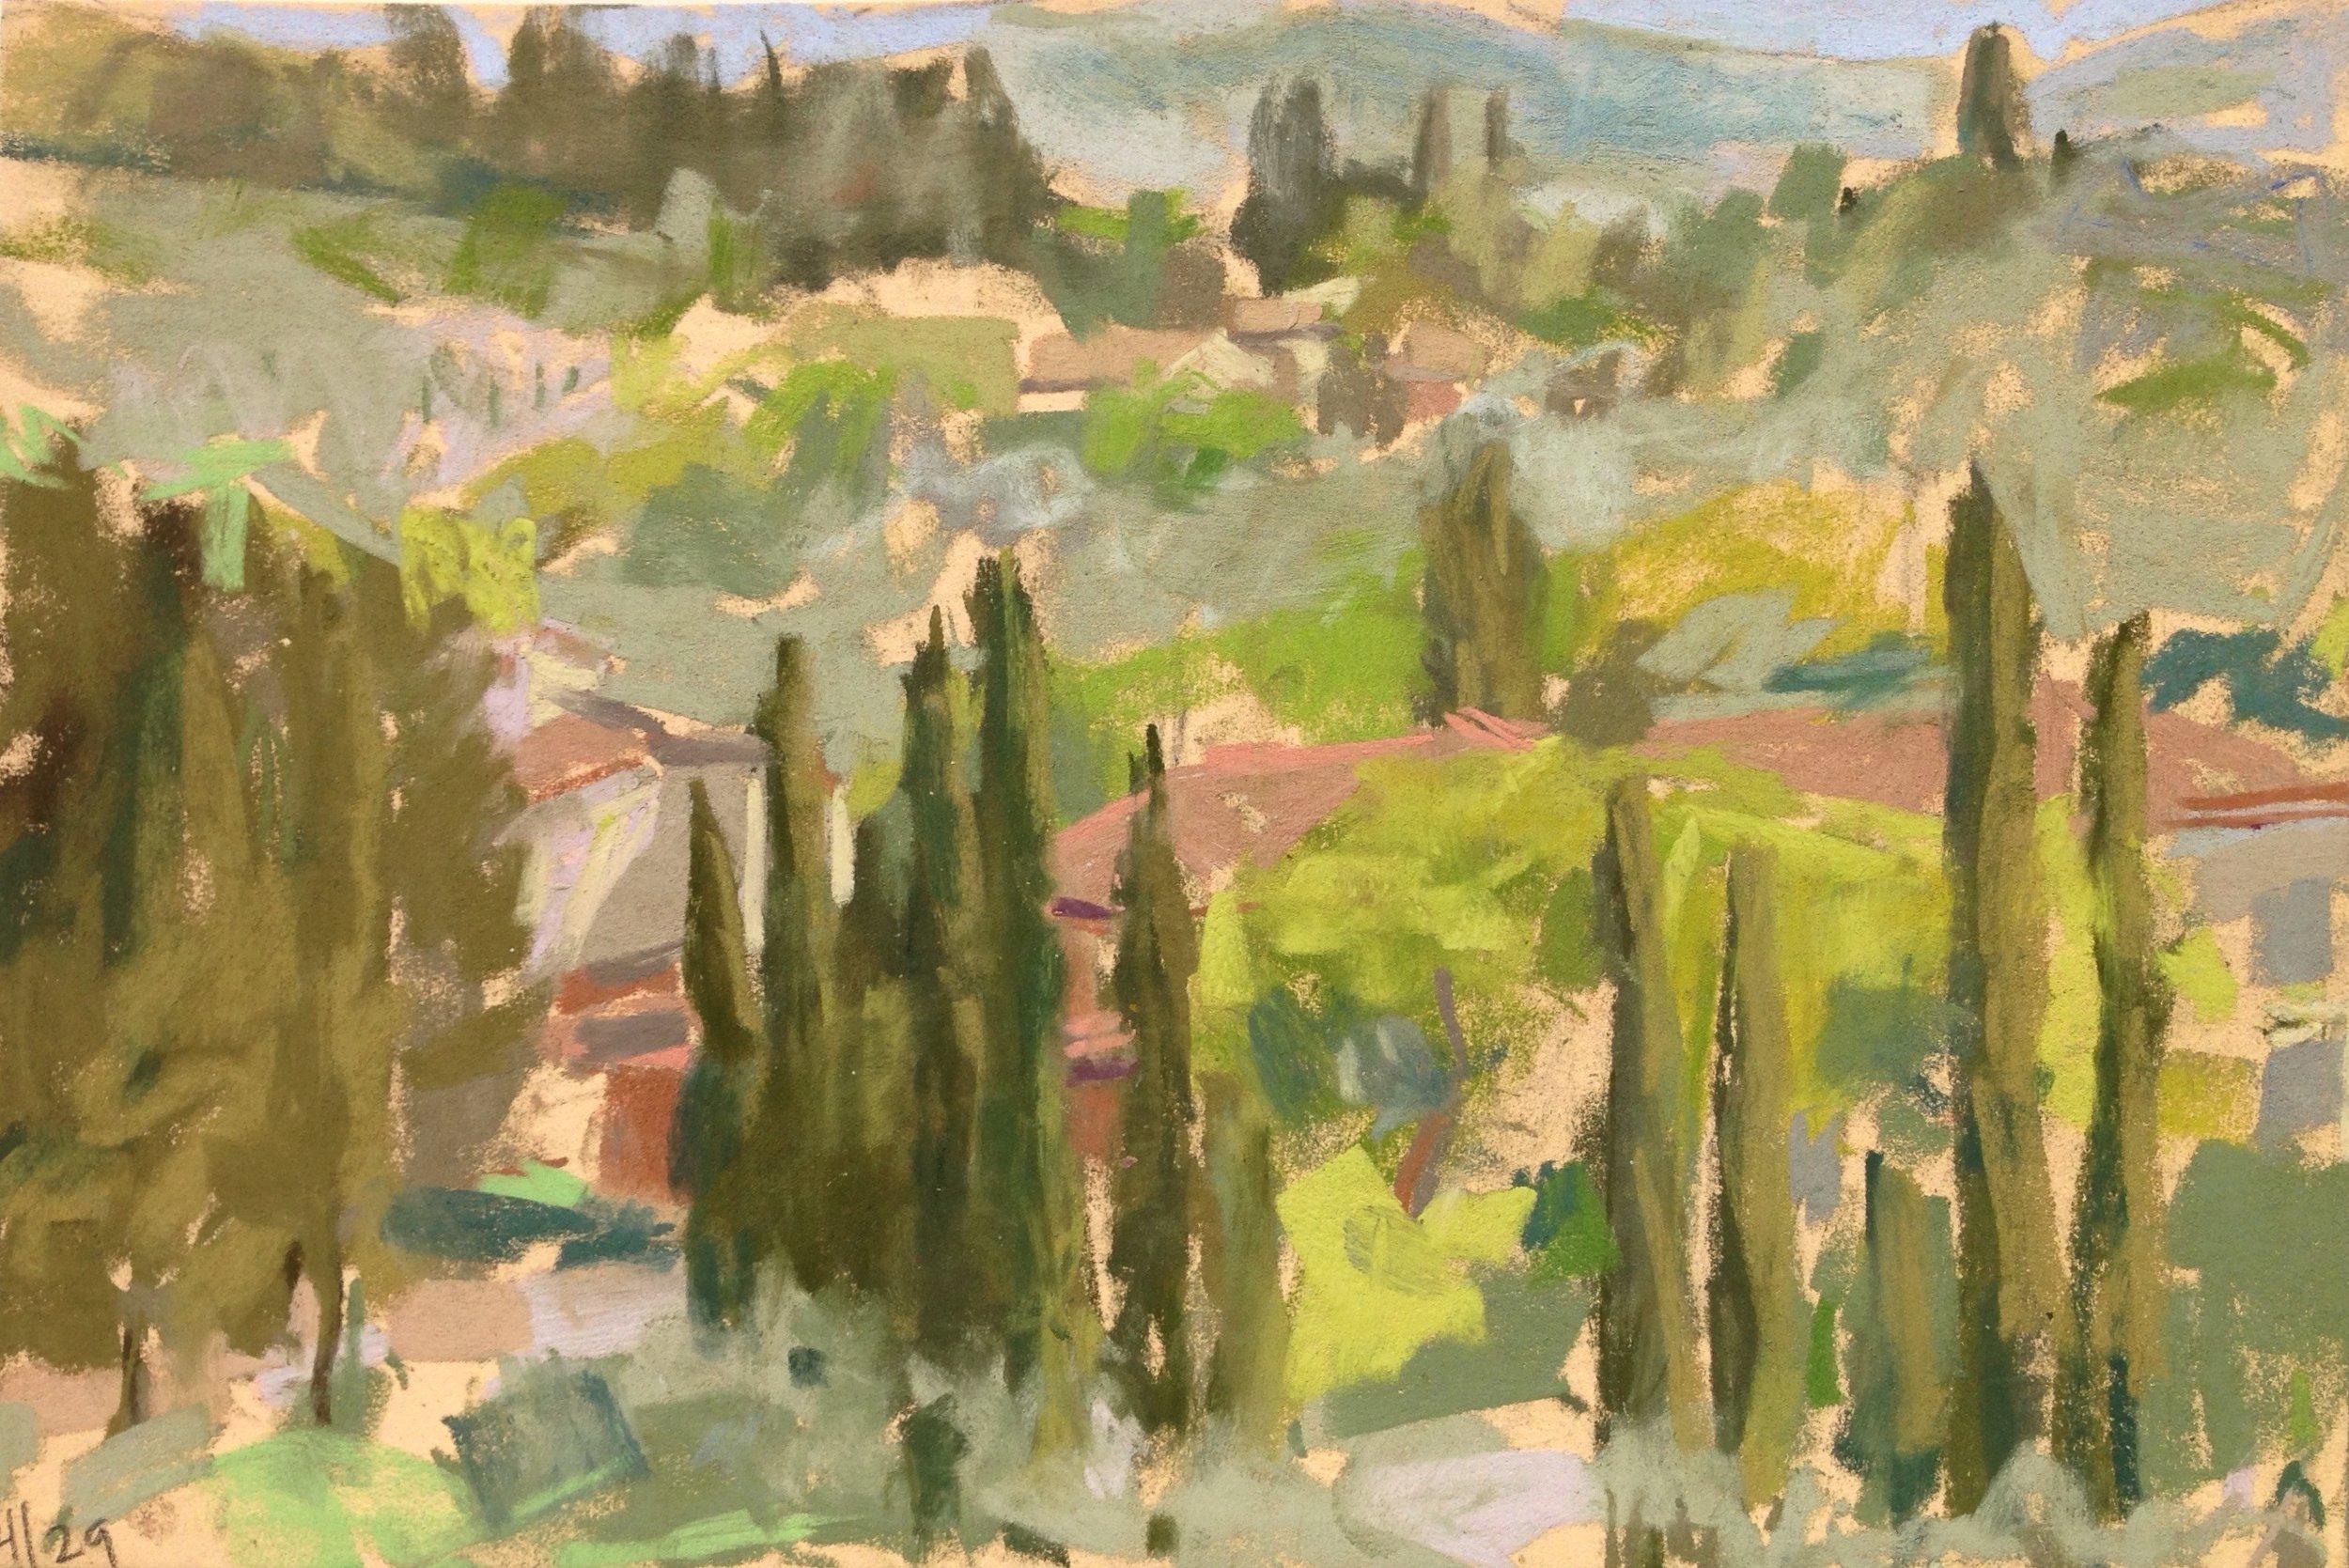 Tuscany, Apr 29